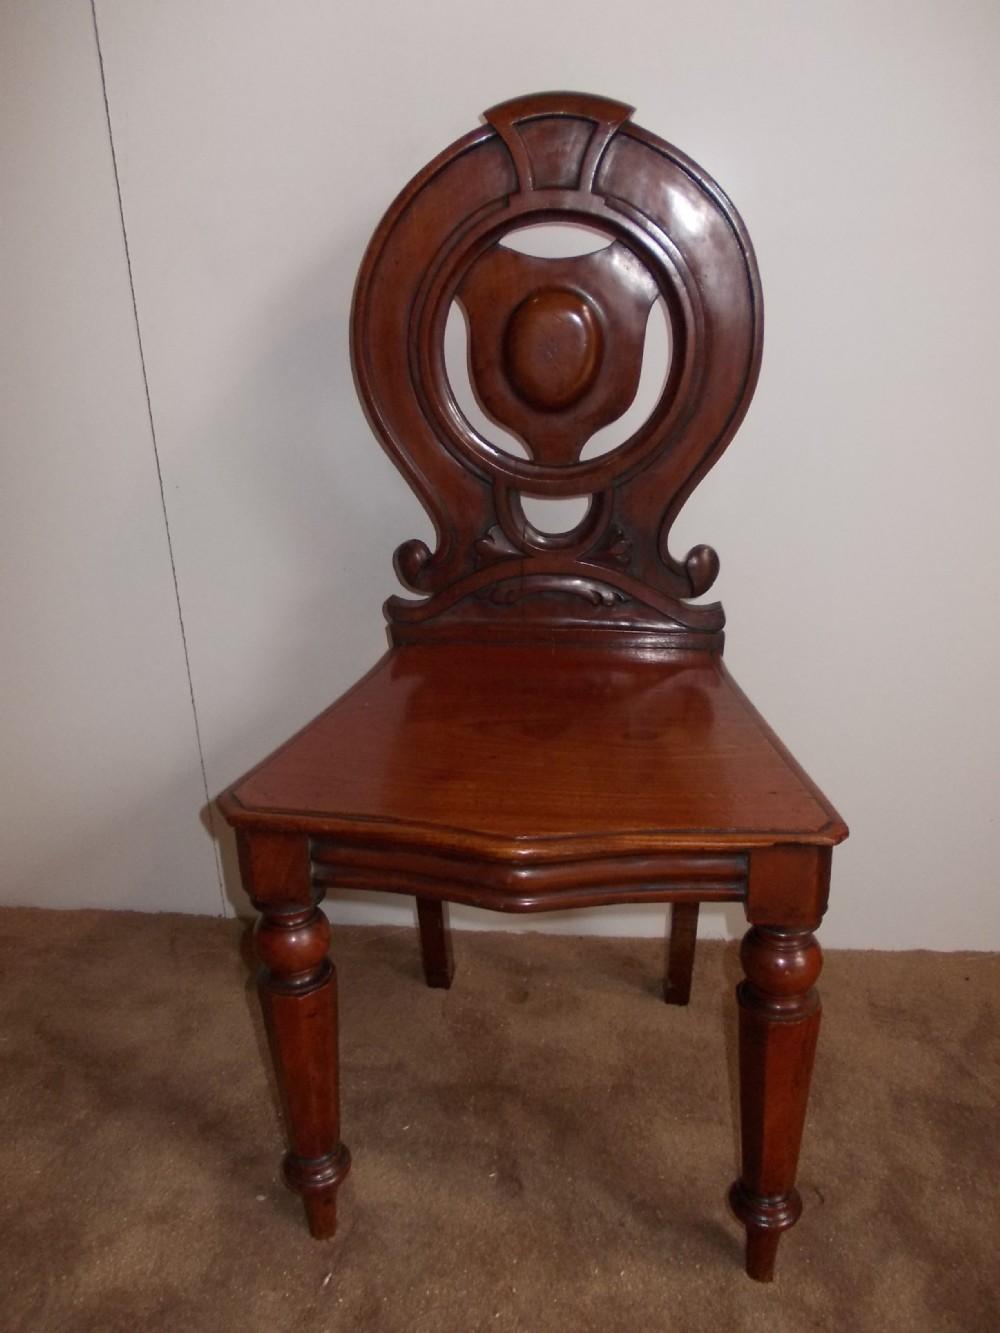 early victorian mahogany hall chair - Early Victorian Mahogany Hall Chair 308209 Sellingantiques.co.uk